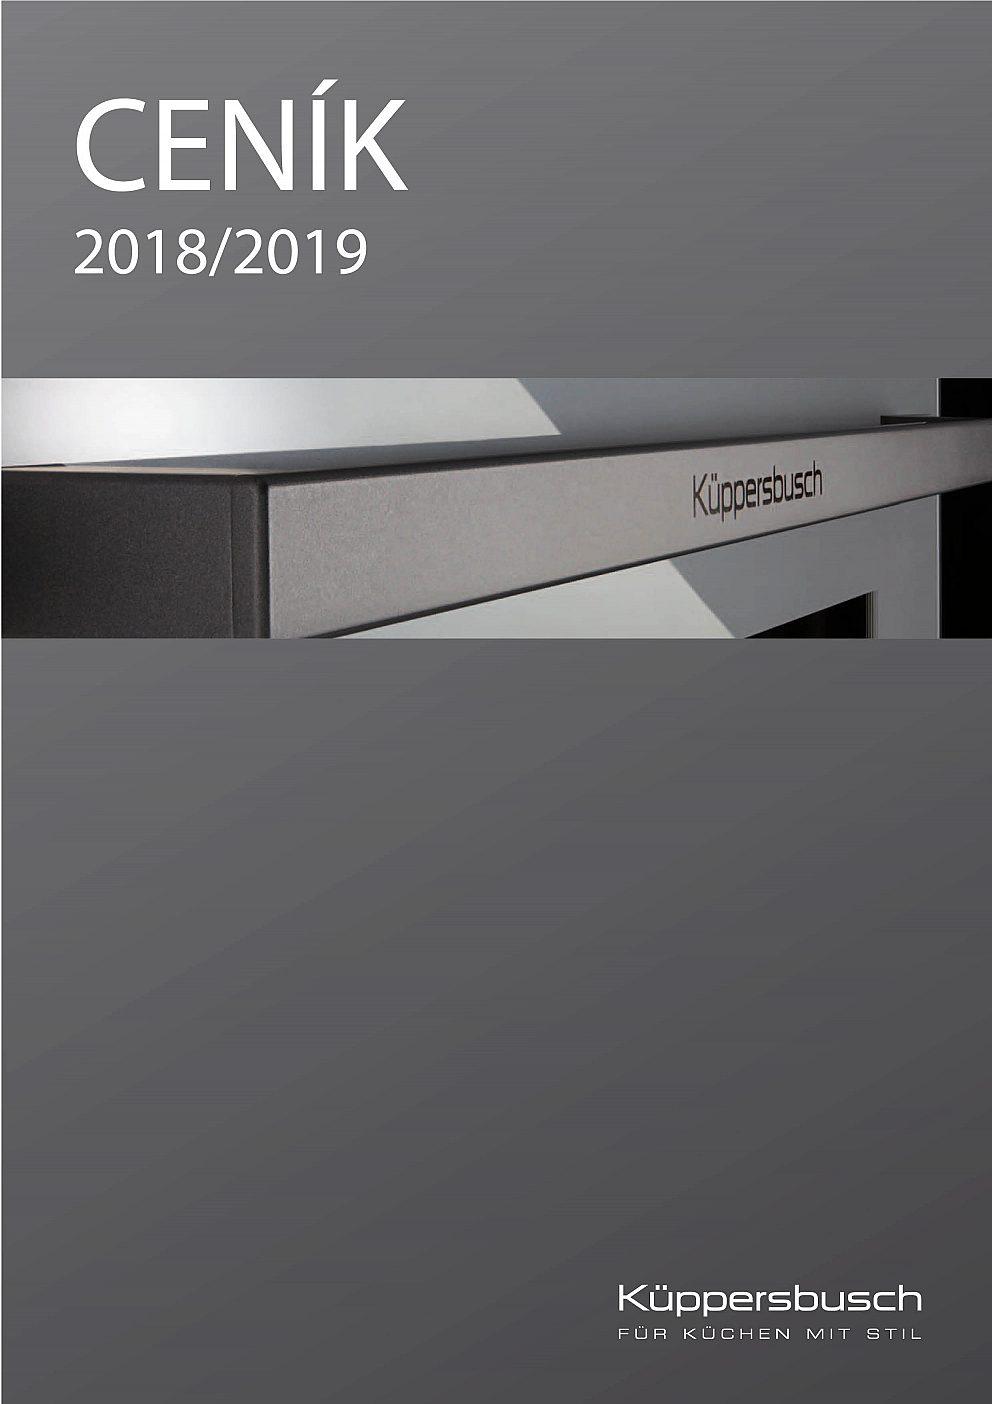 Kuppersbusch - Cenník 2018/2019